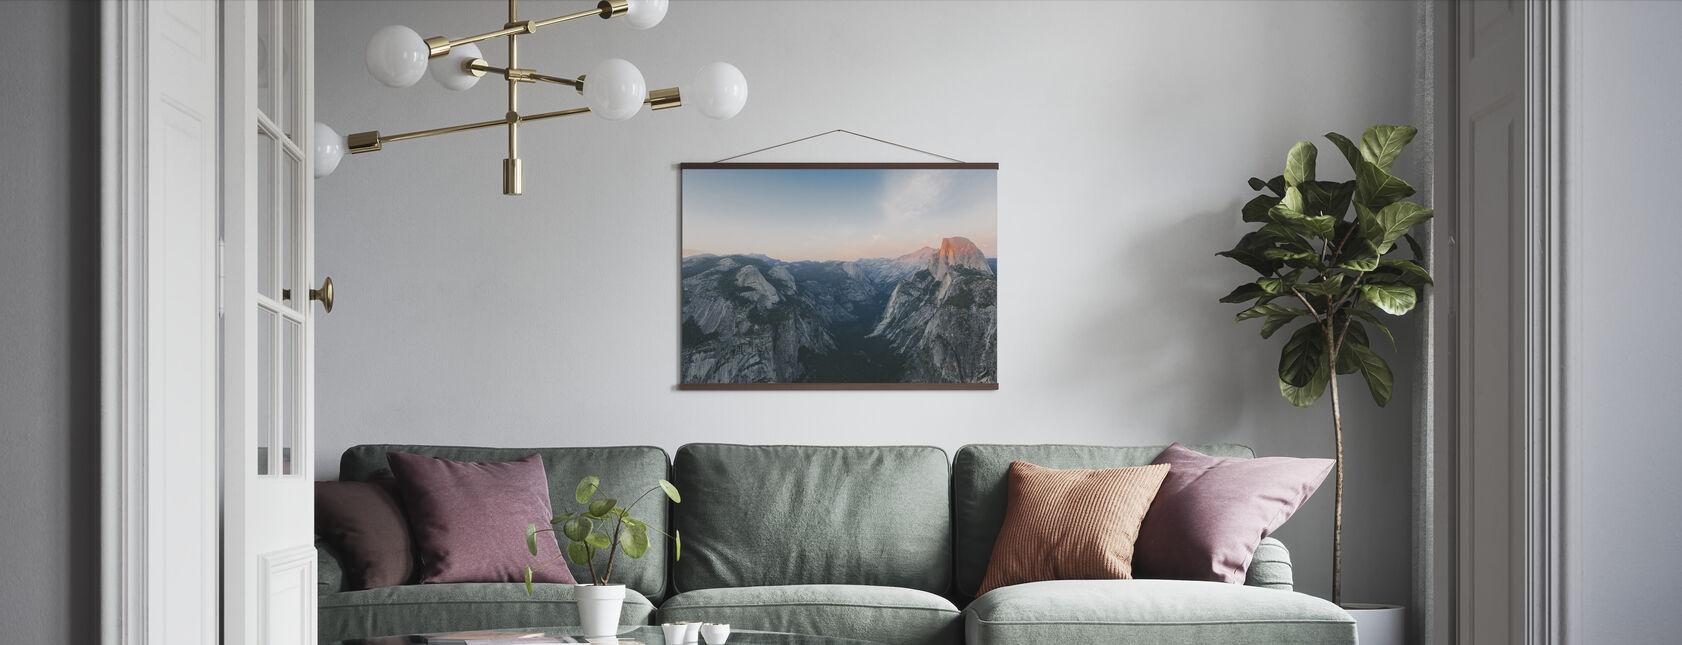 Halv kuppel, Yosemite National Park - Plakat - Stue